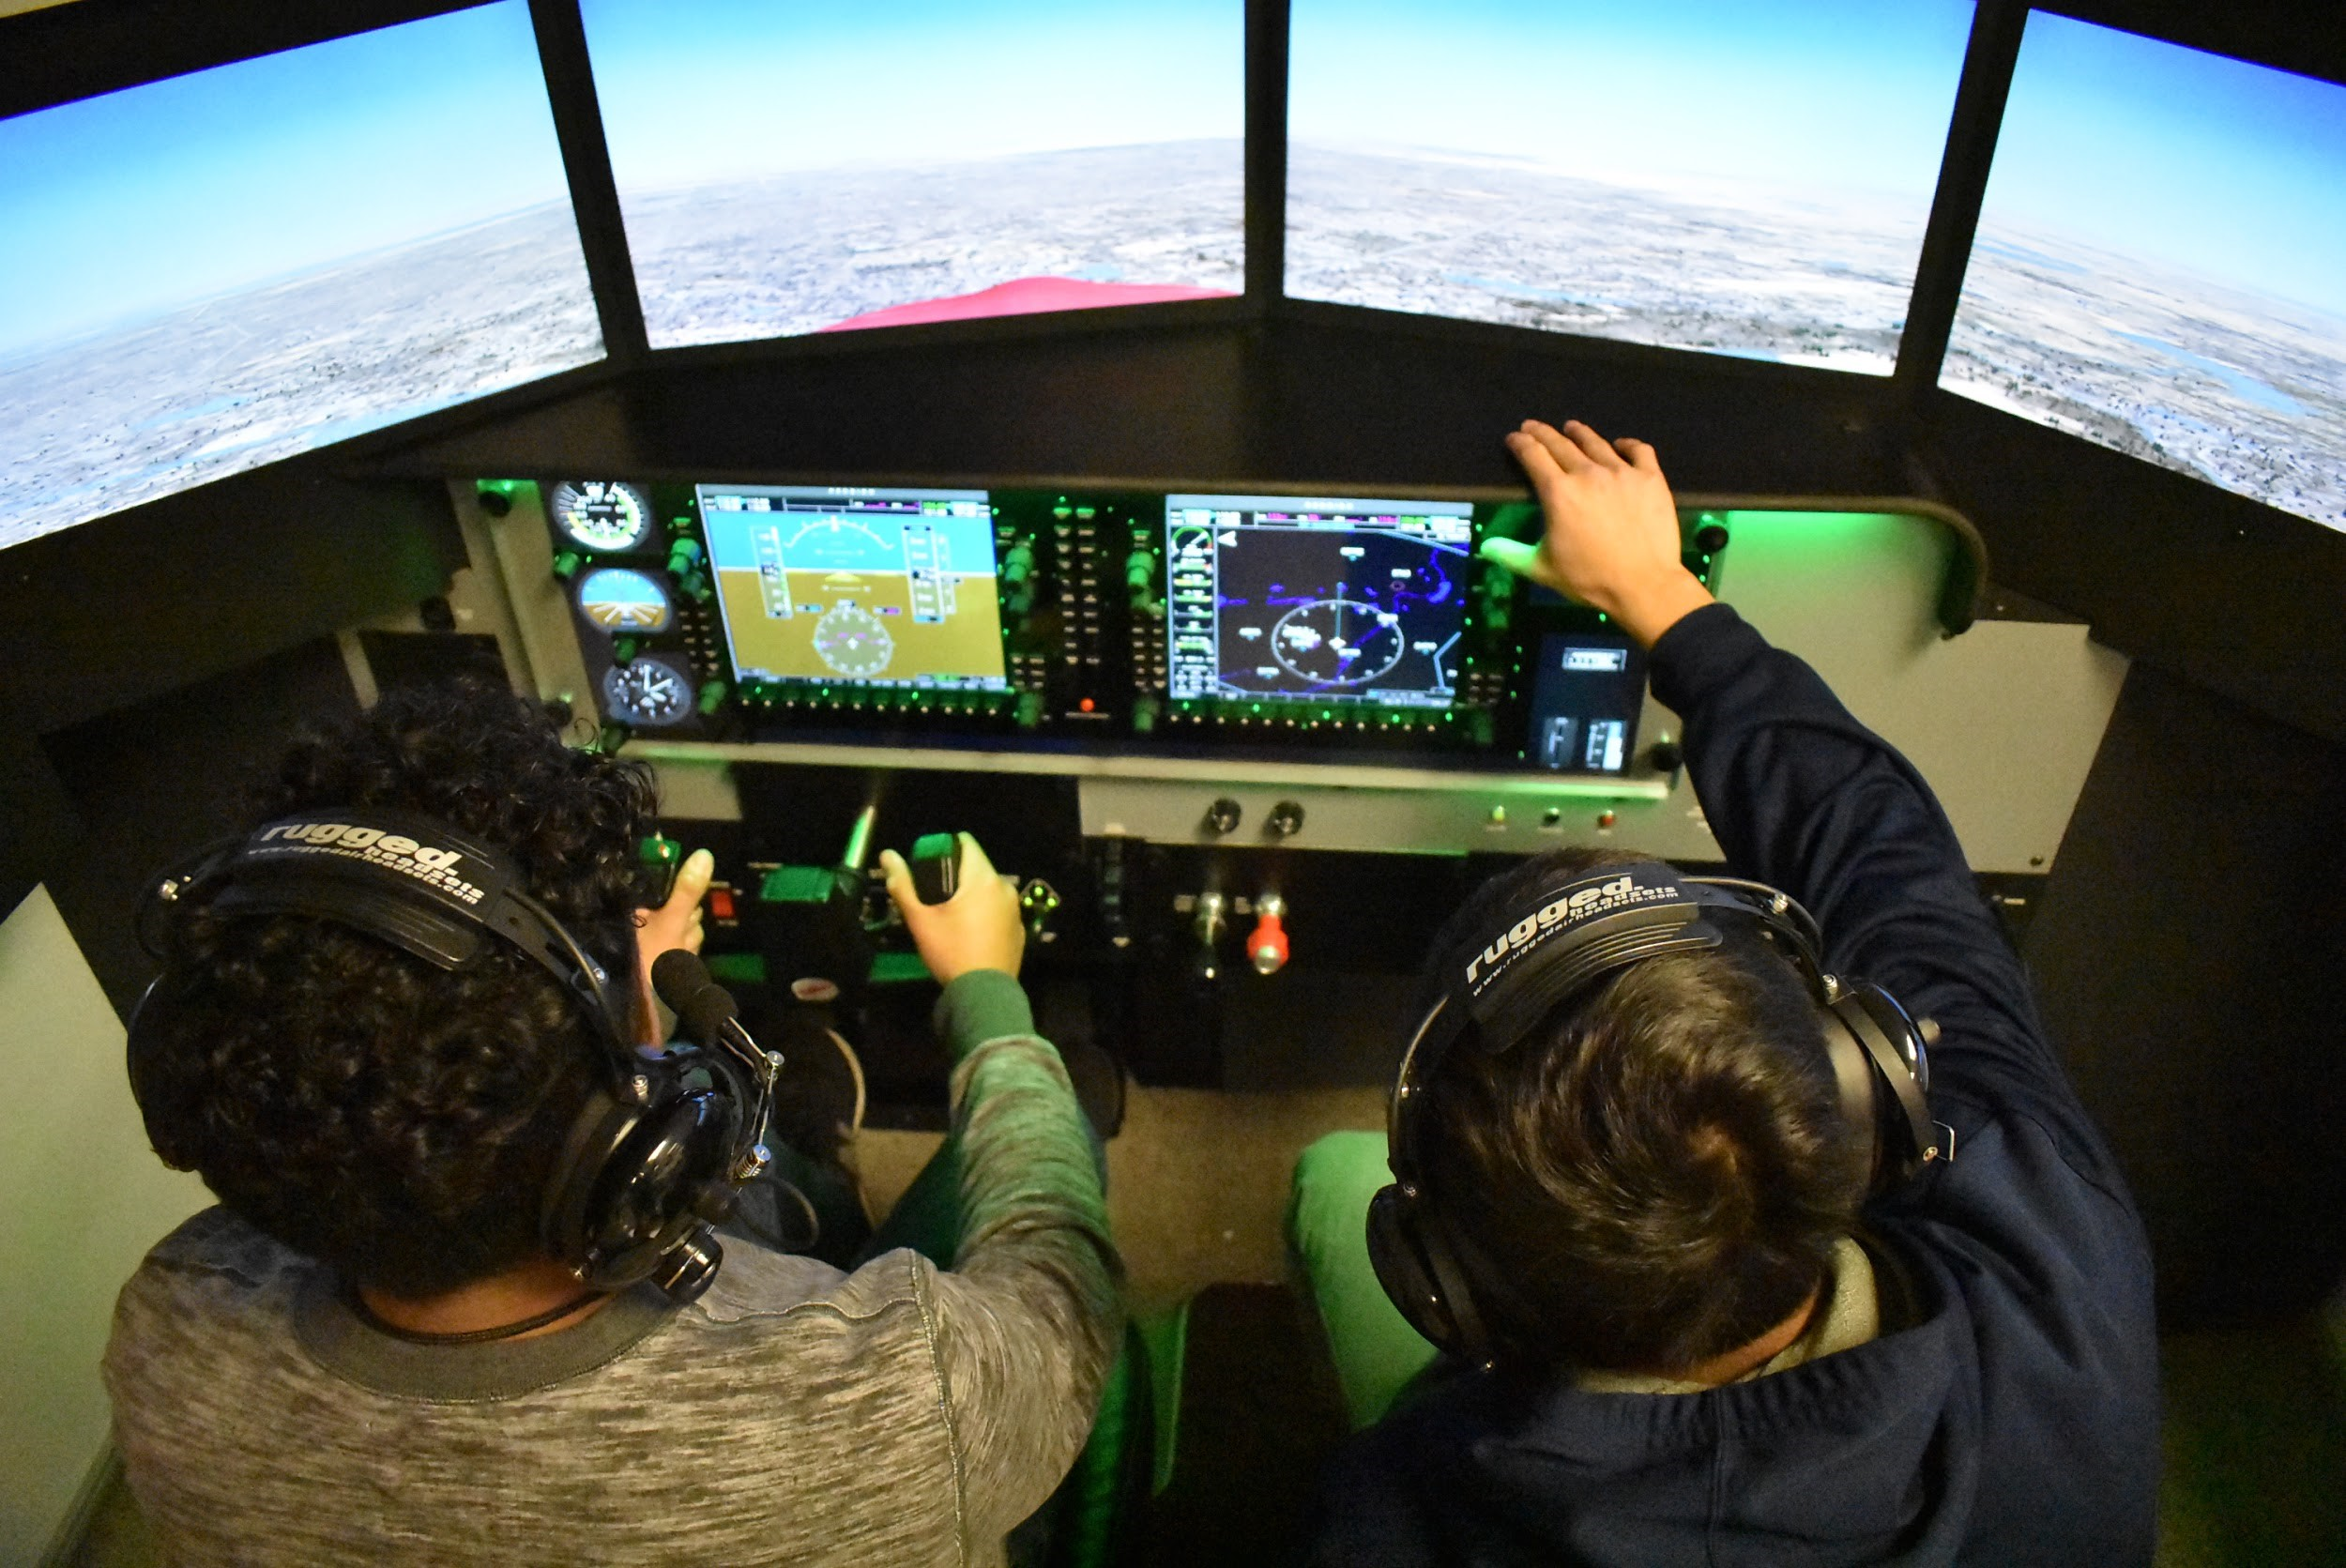 Career & Technical Education Program Focuses on Aviation